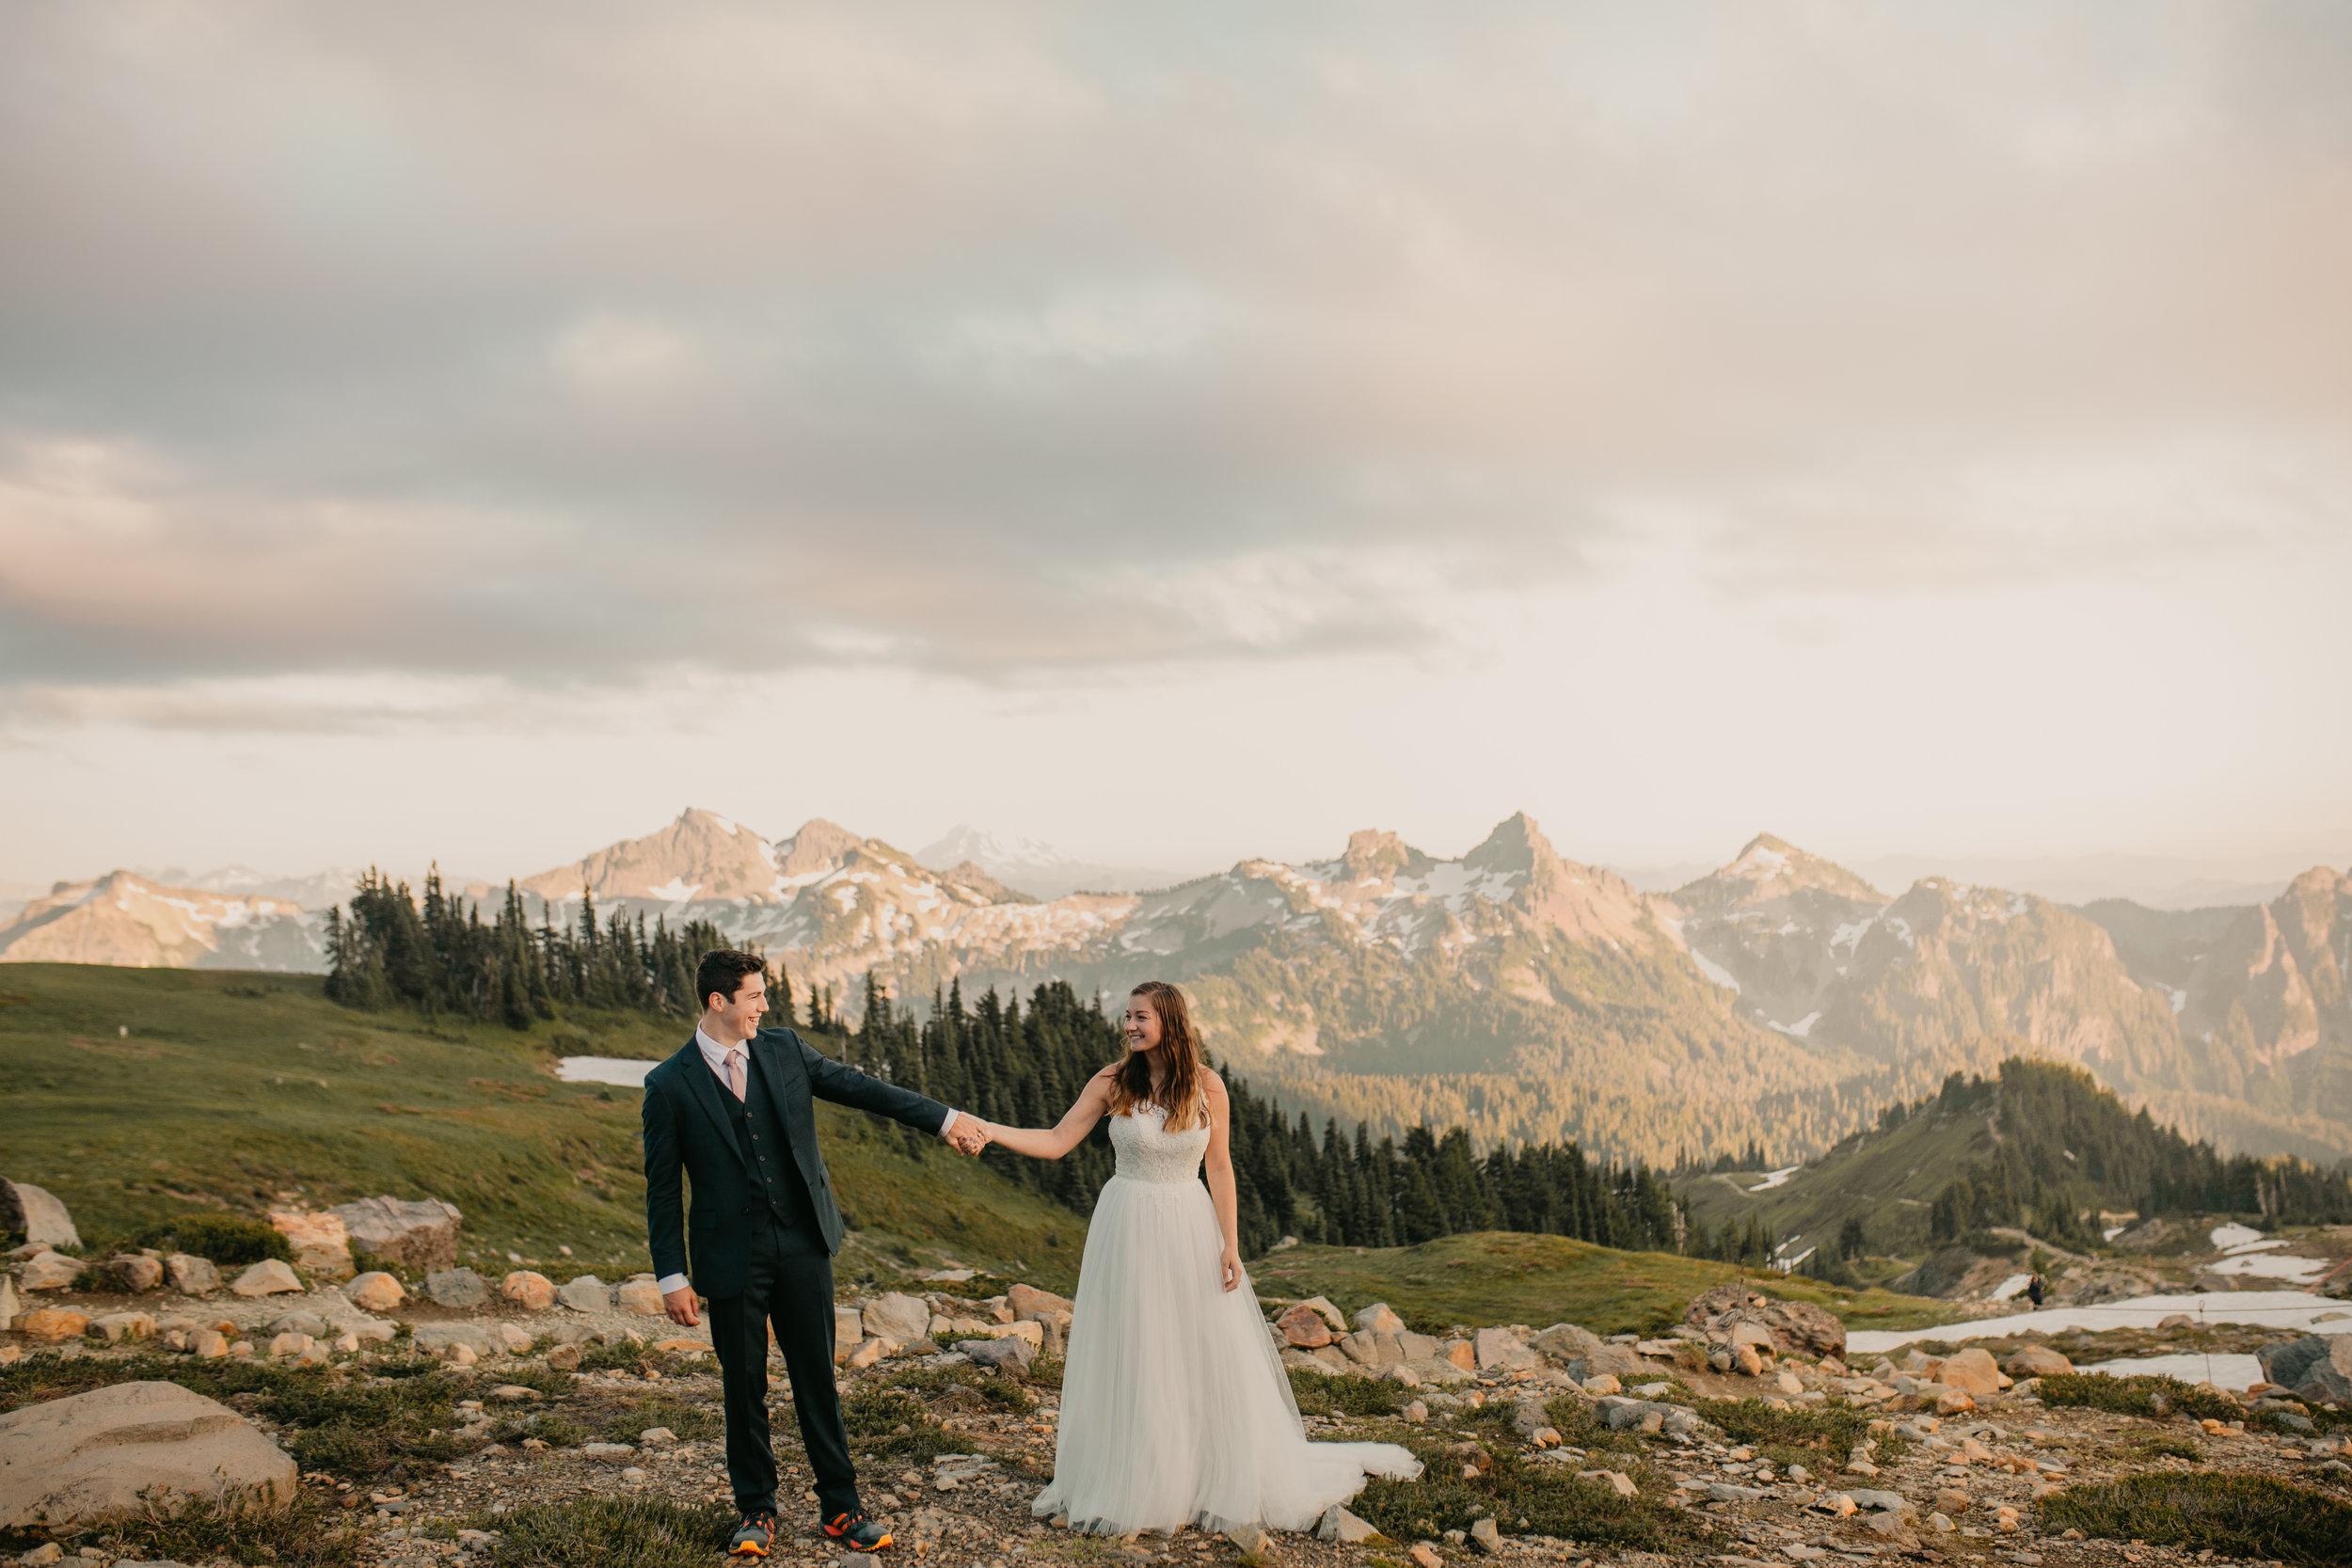 Nicole-Daacke-Photography-Mt-Rainier-elopement-photographer-washington-mountain-epic-wedding-photography-wildflowers-at-rainier-pine-tree-cloudy-summer-day-at-mountain-rainier-43.jpg